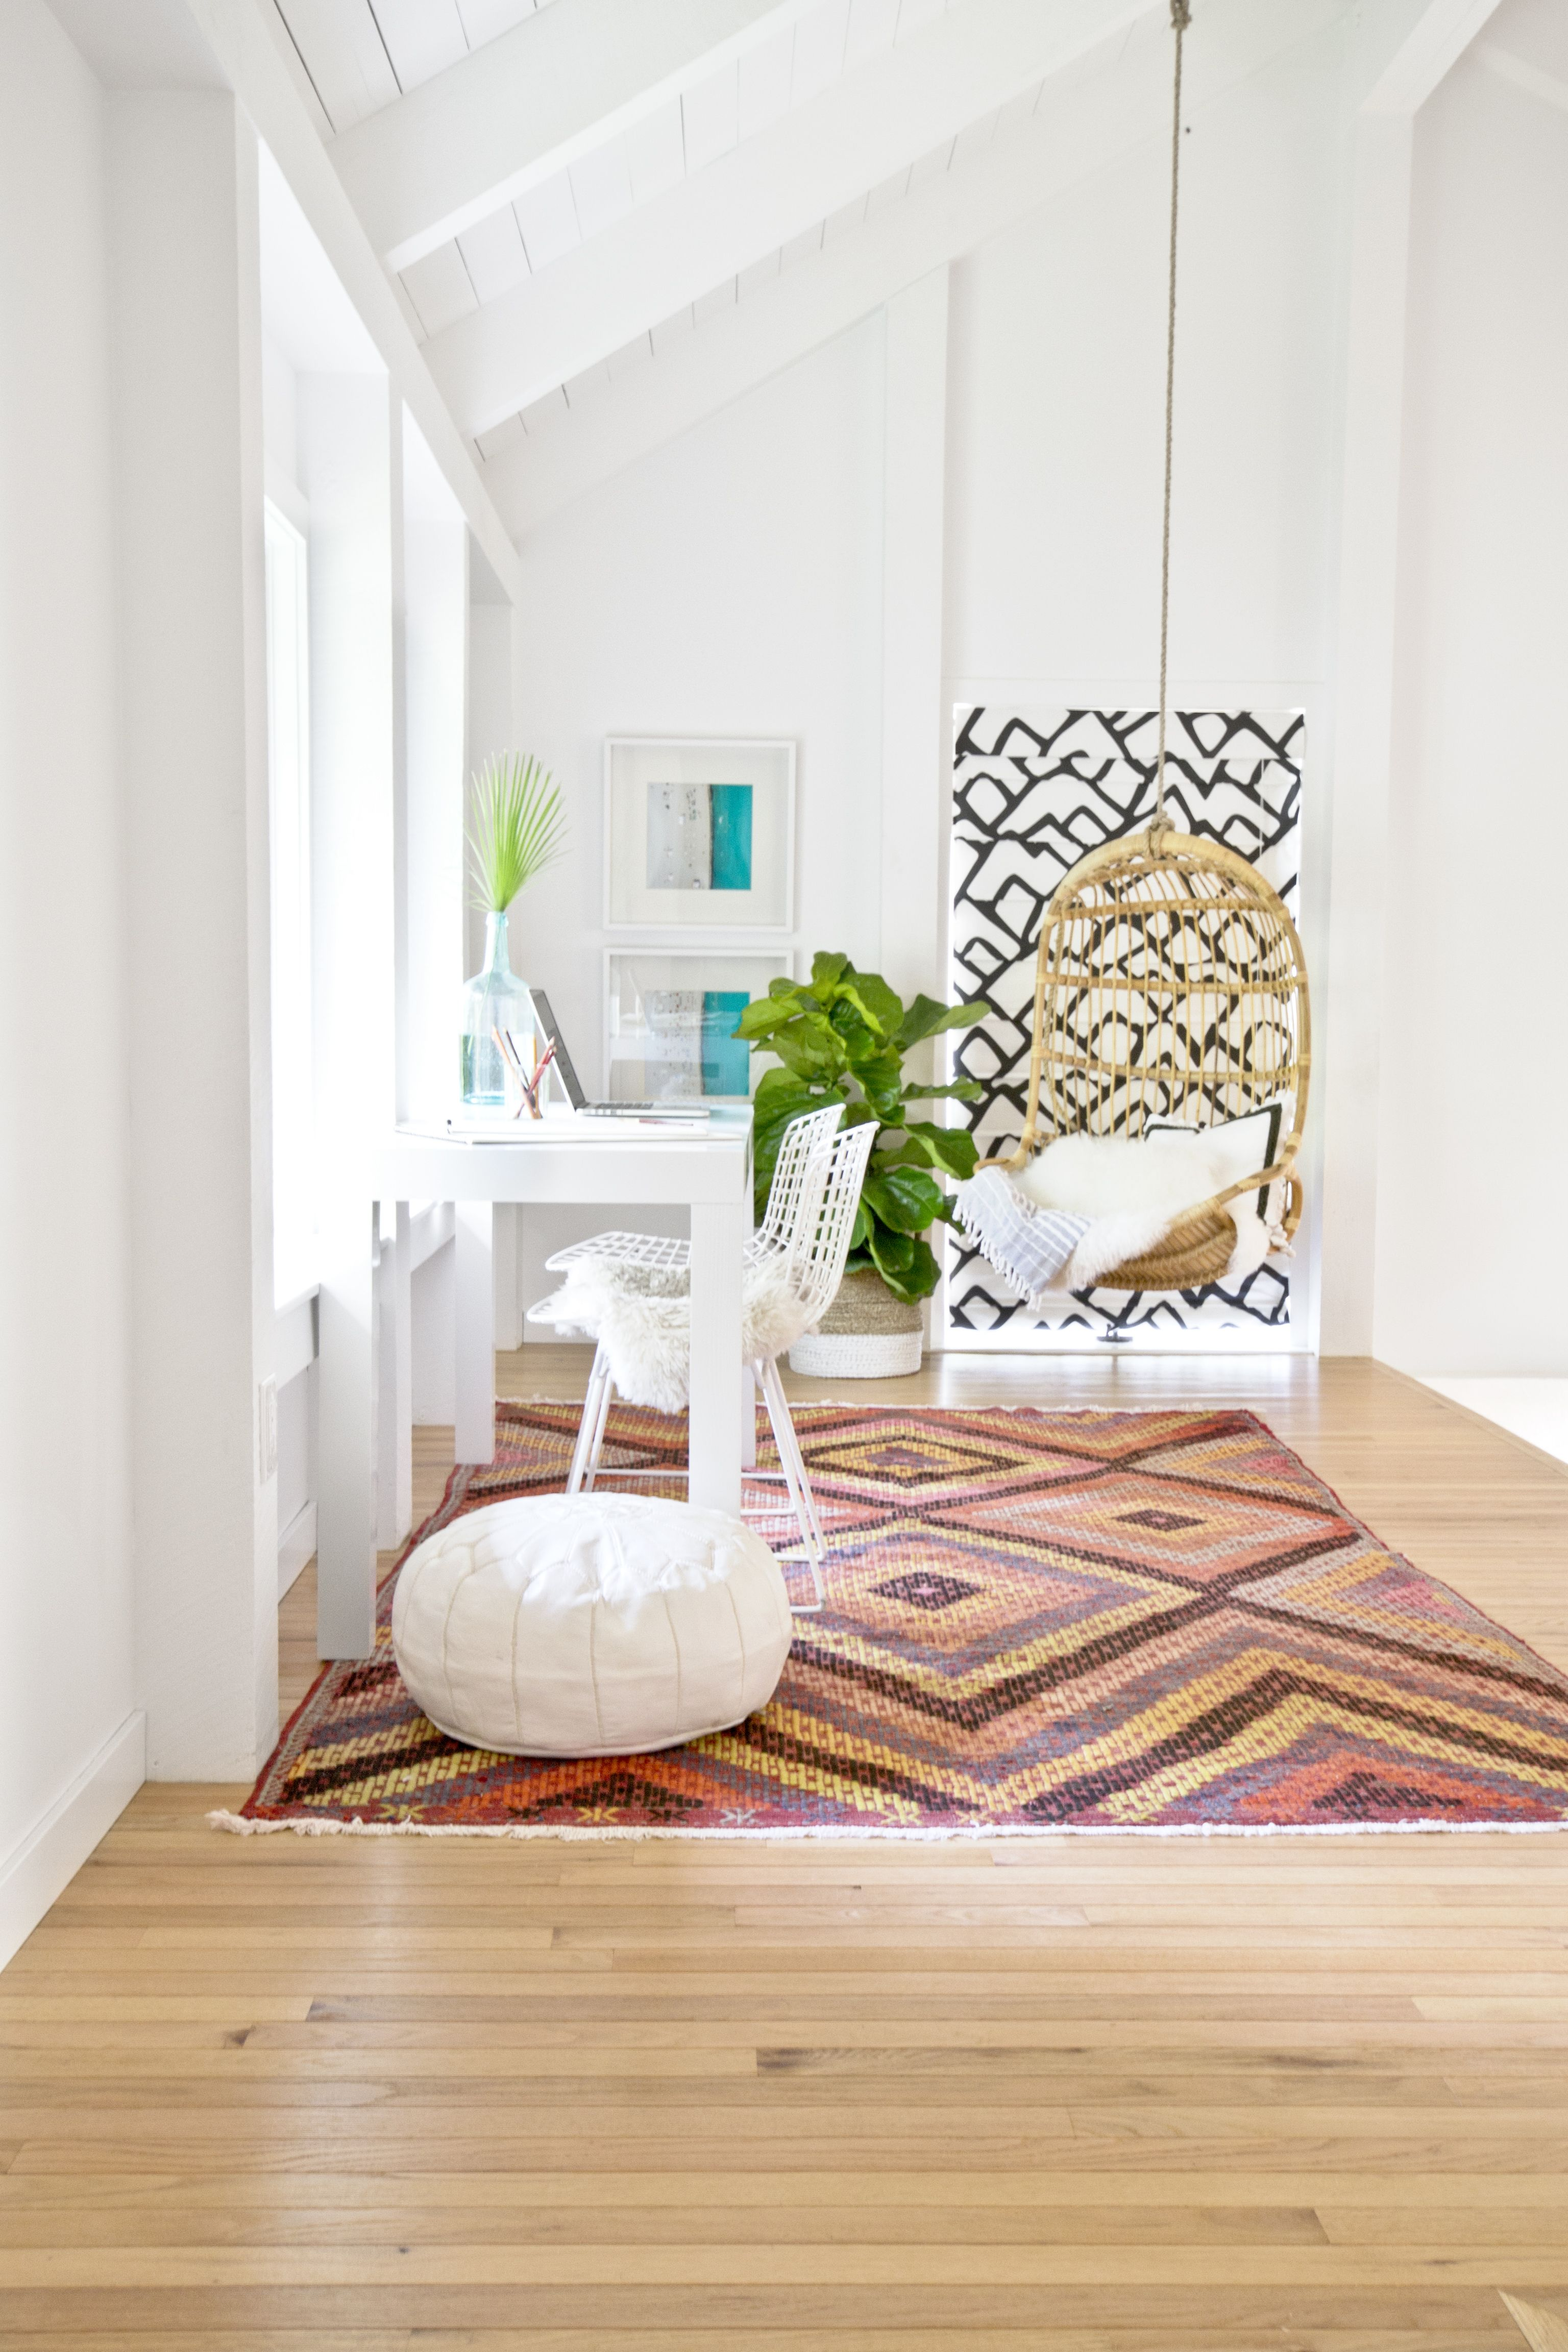 Refinishing Hardwood Floors With A Rental Floor Sander Refinishing Hardwood Floors Refinishing Floors Home